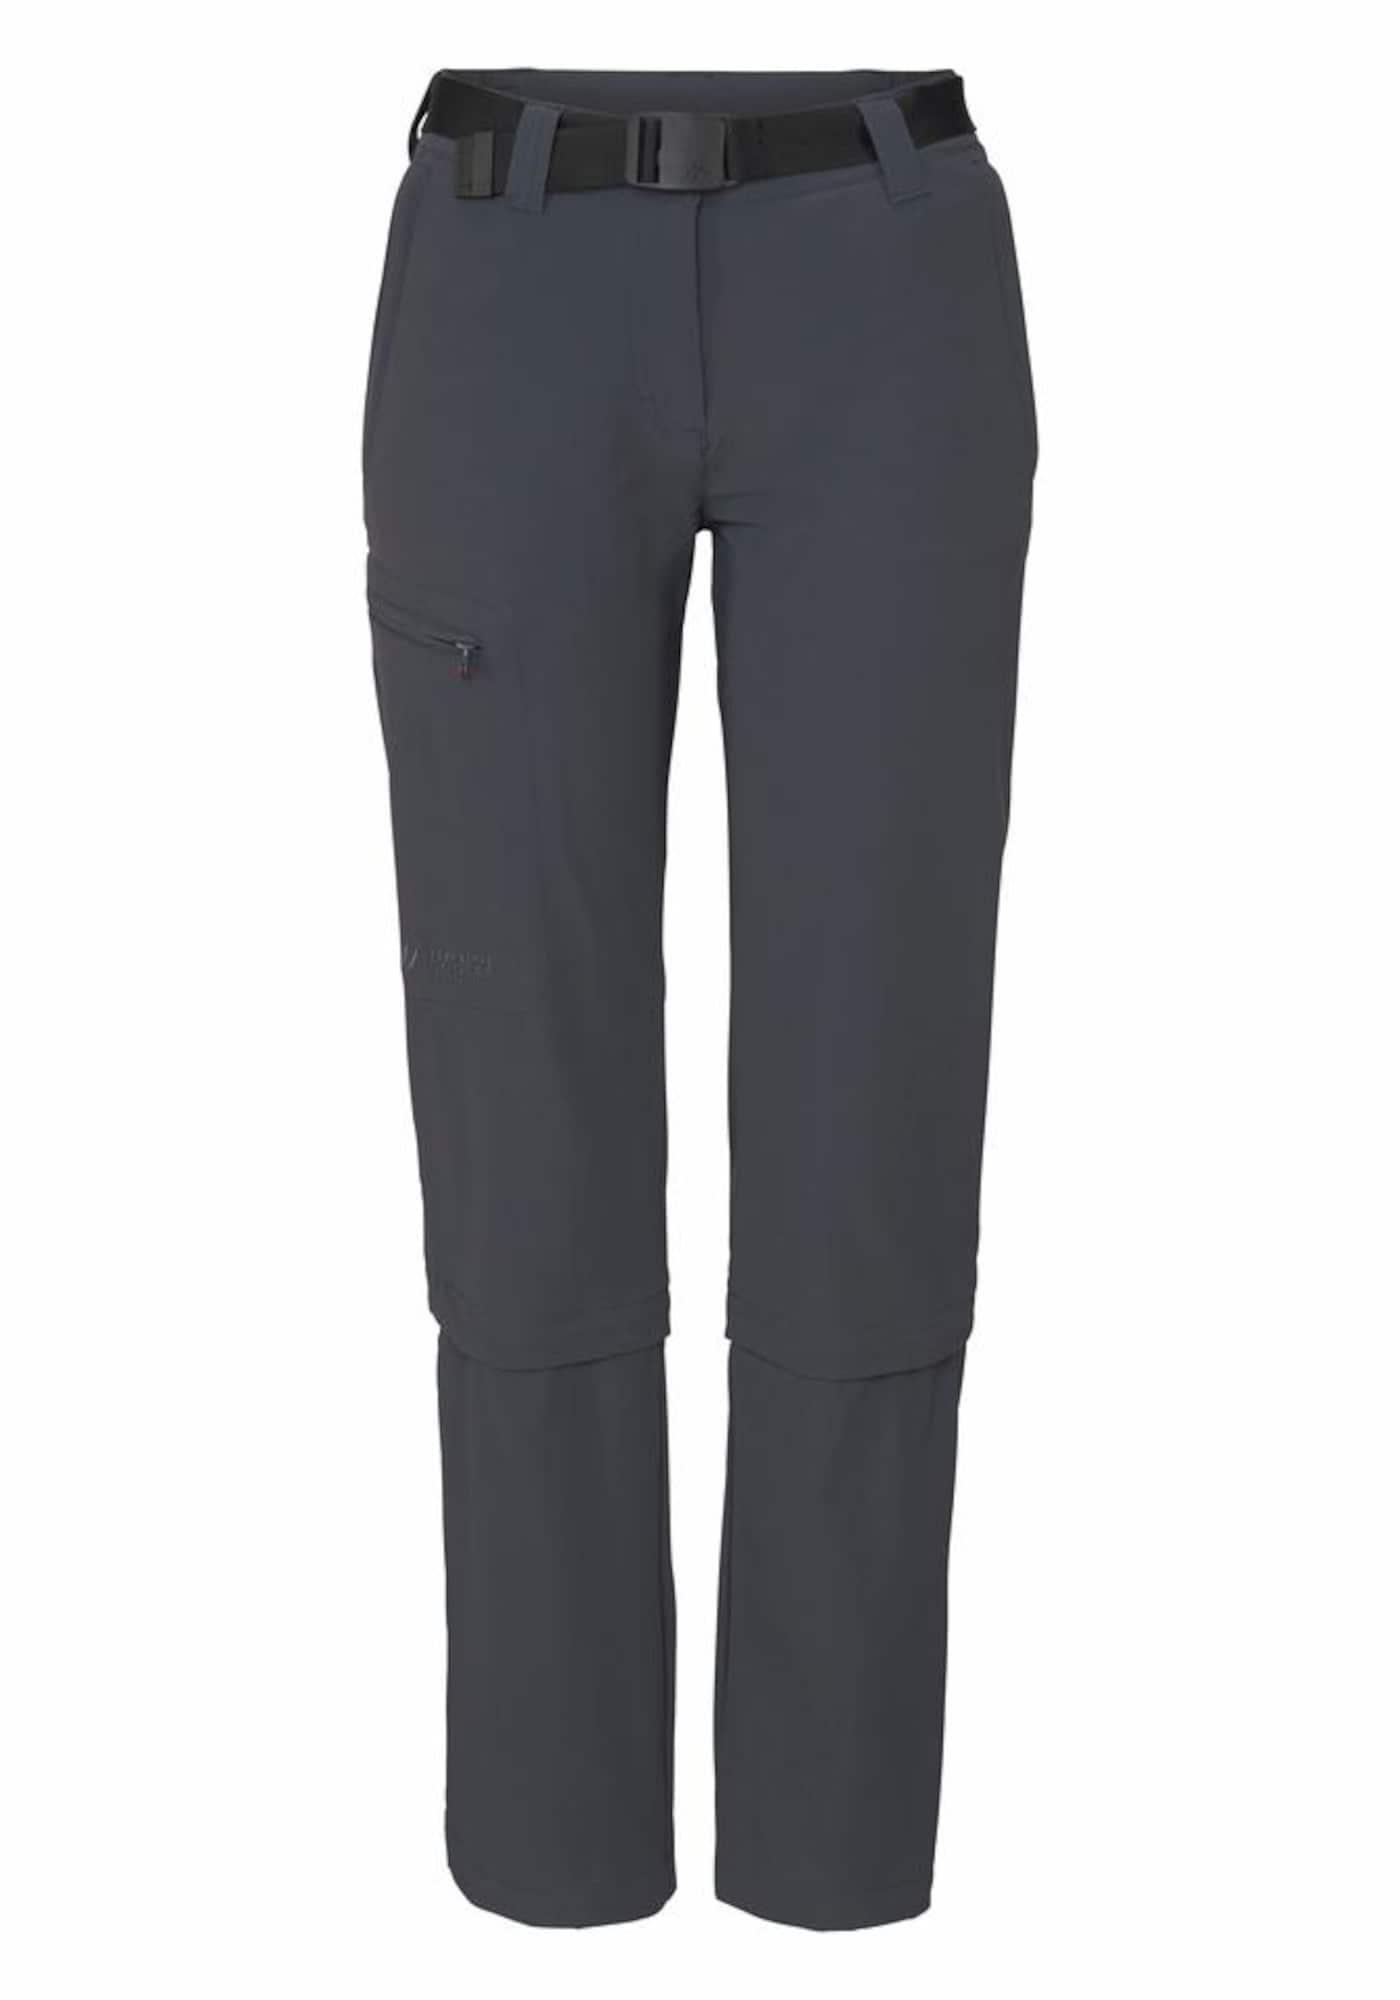 Trekkinghose 'AROLLA' | Sportbekleidung > Sporthosen > Trekkinghosen | maier sports